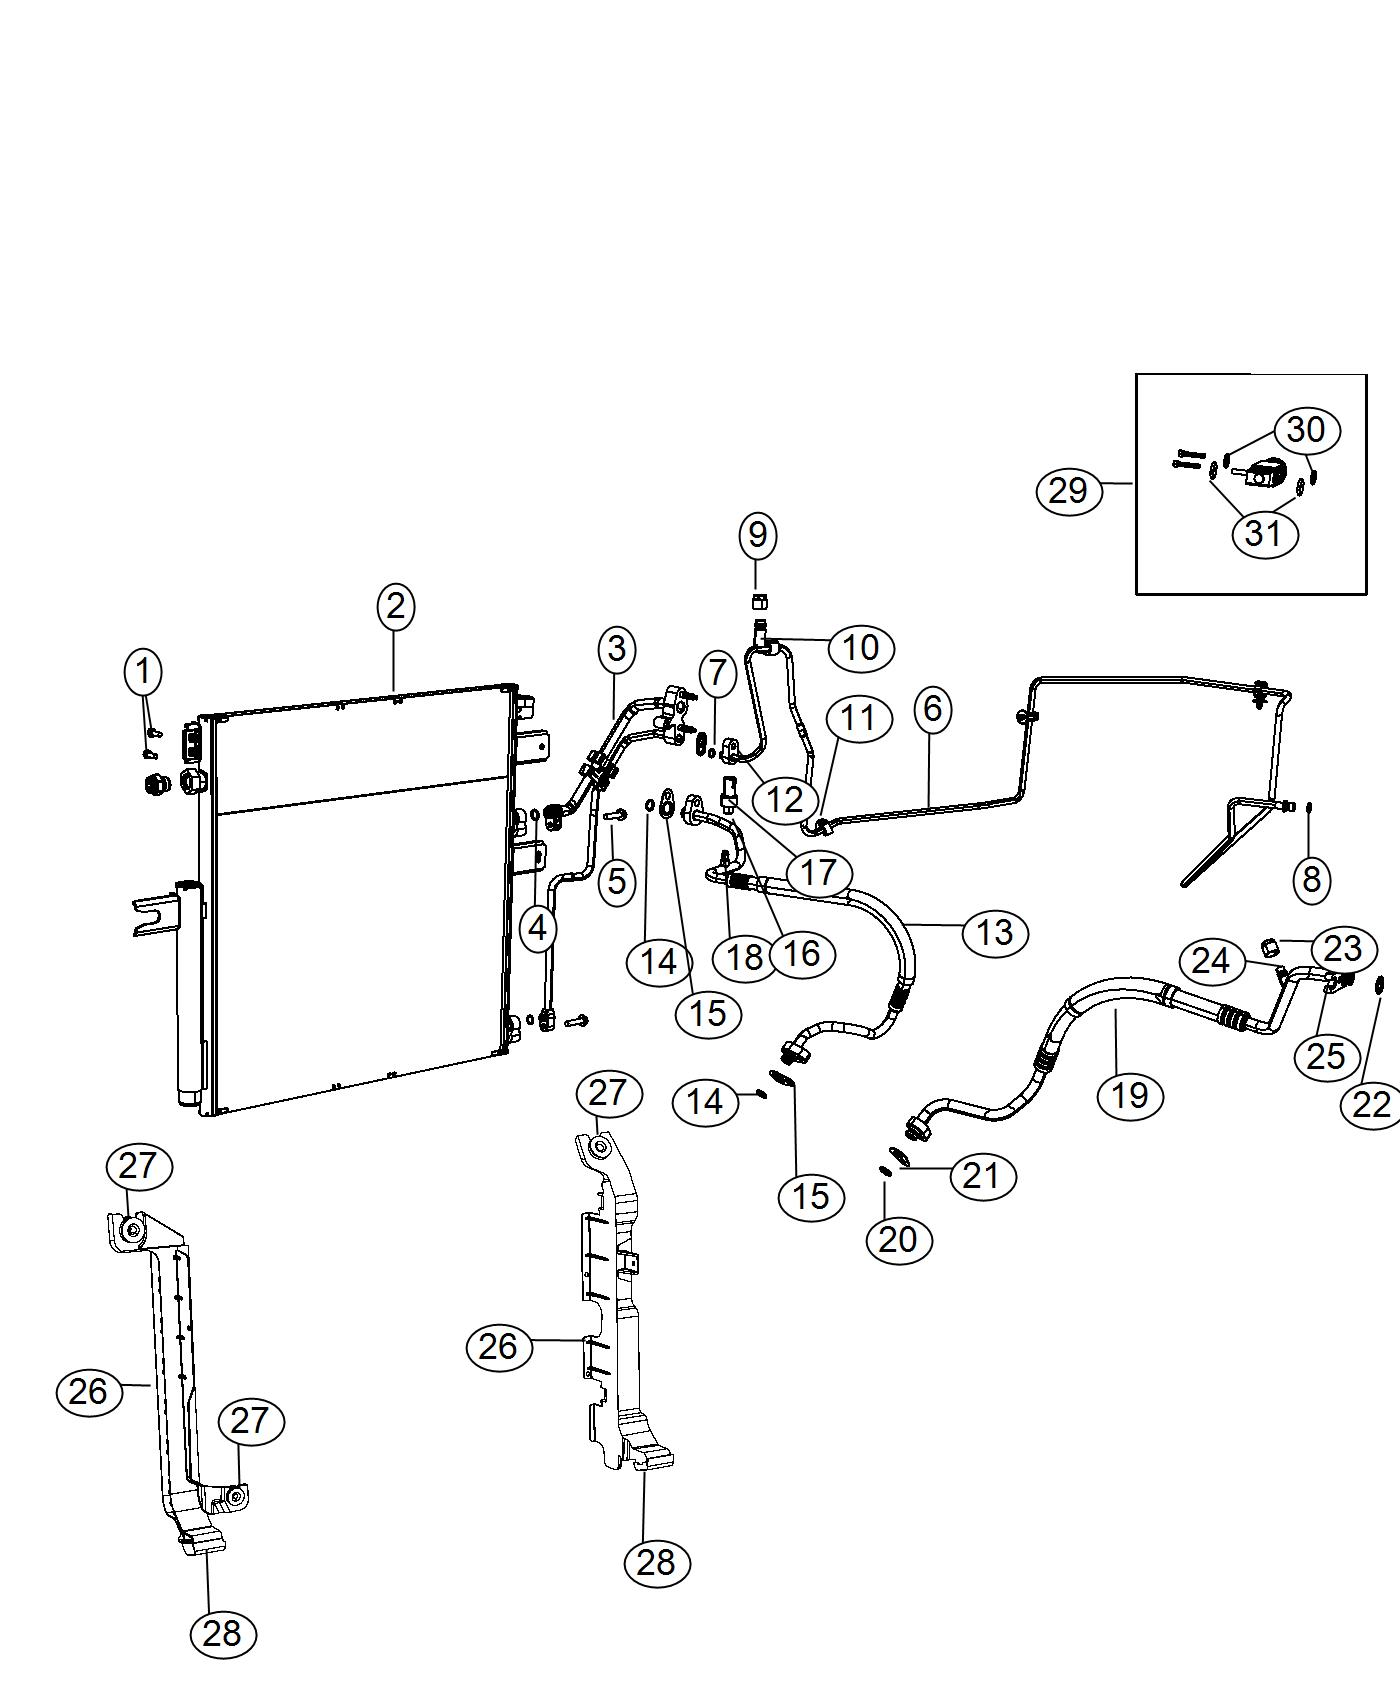 Ram 4500 Bracket. Radiator to condenser. Left. Plumbing